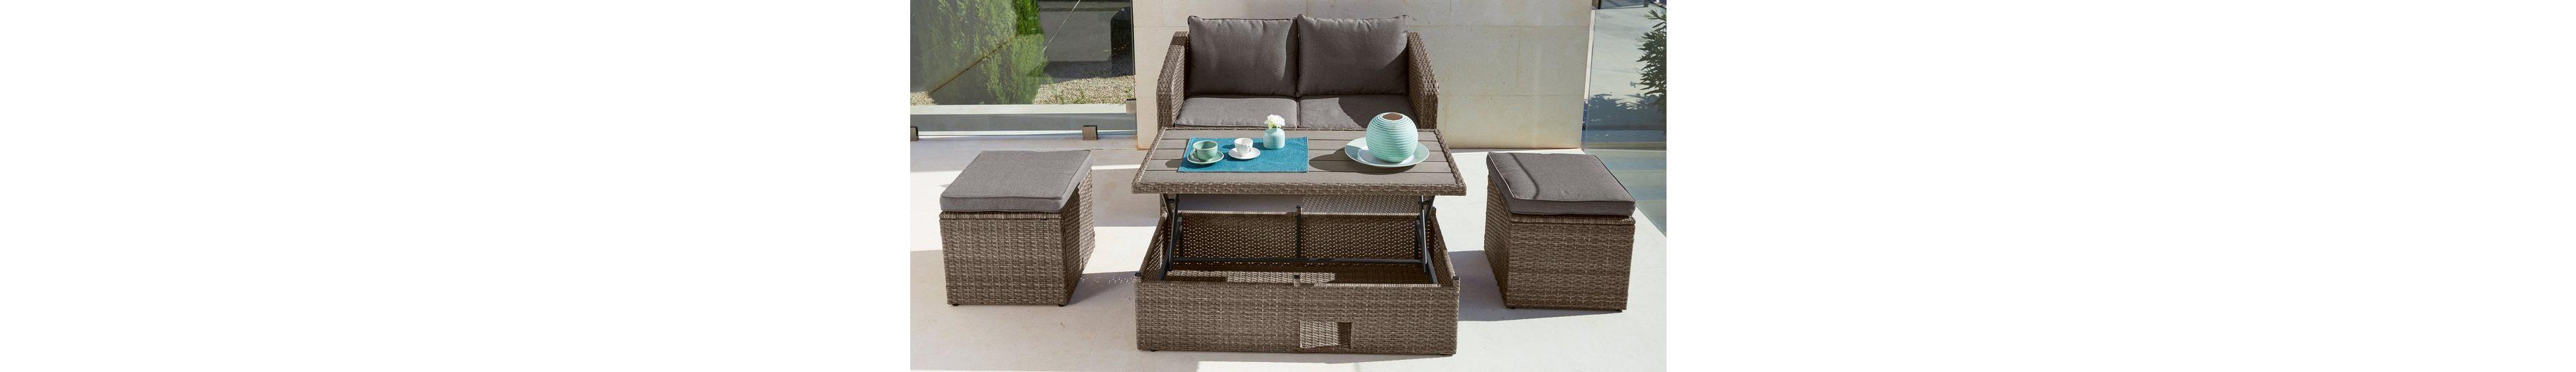 10-tgl. Gartenmöbelset »Lagos«, 2er-Sofa, 2 Hocker, Tisch 111x57 cm, Polyrattan,braun